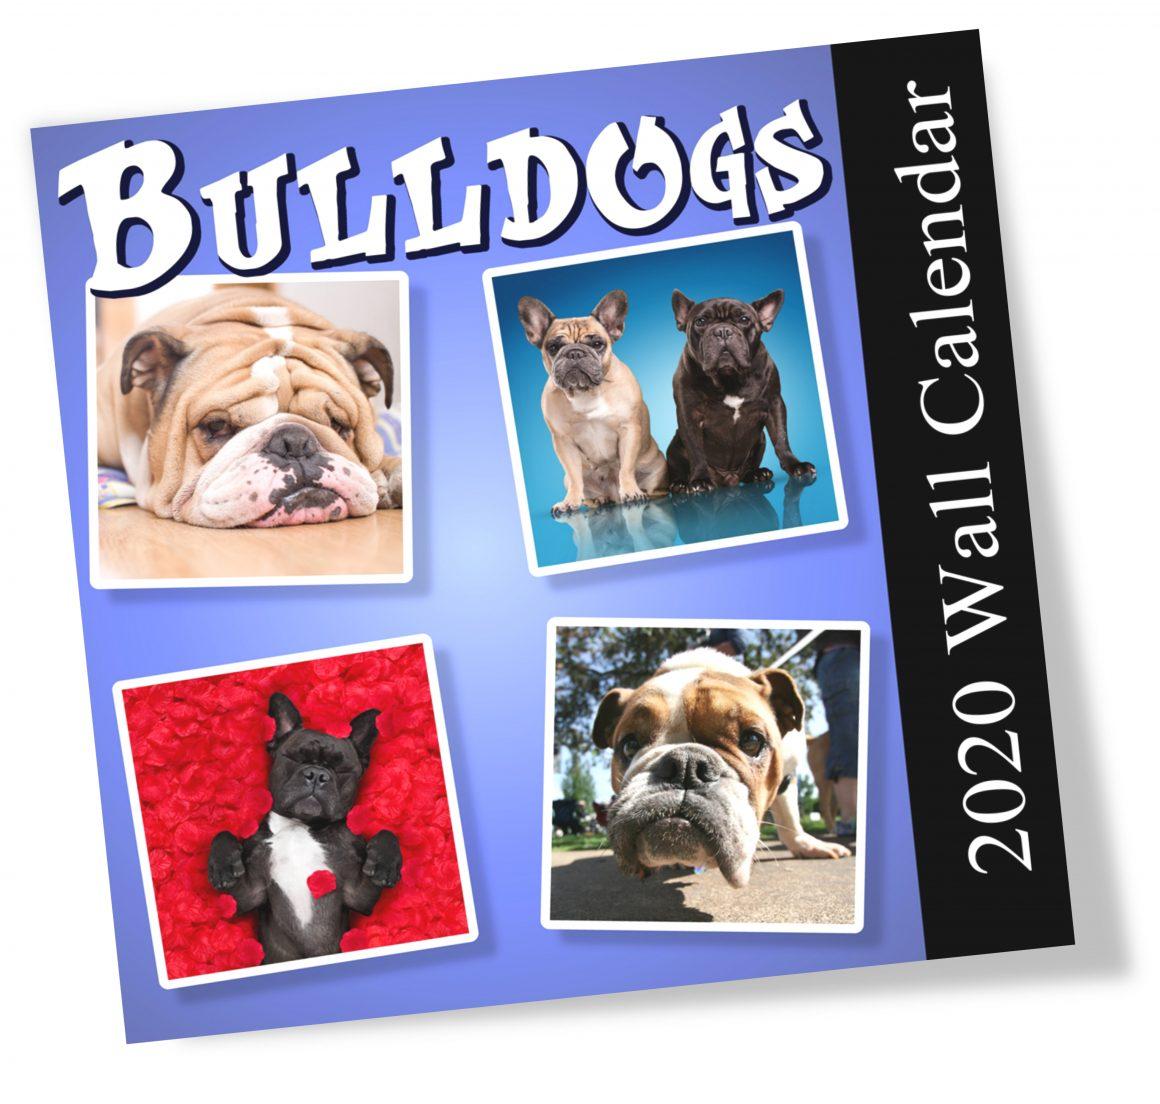 bulldog - 01